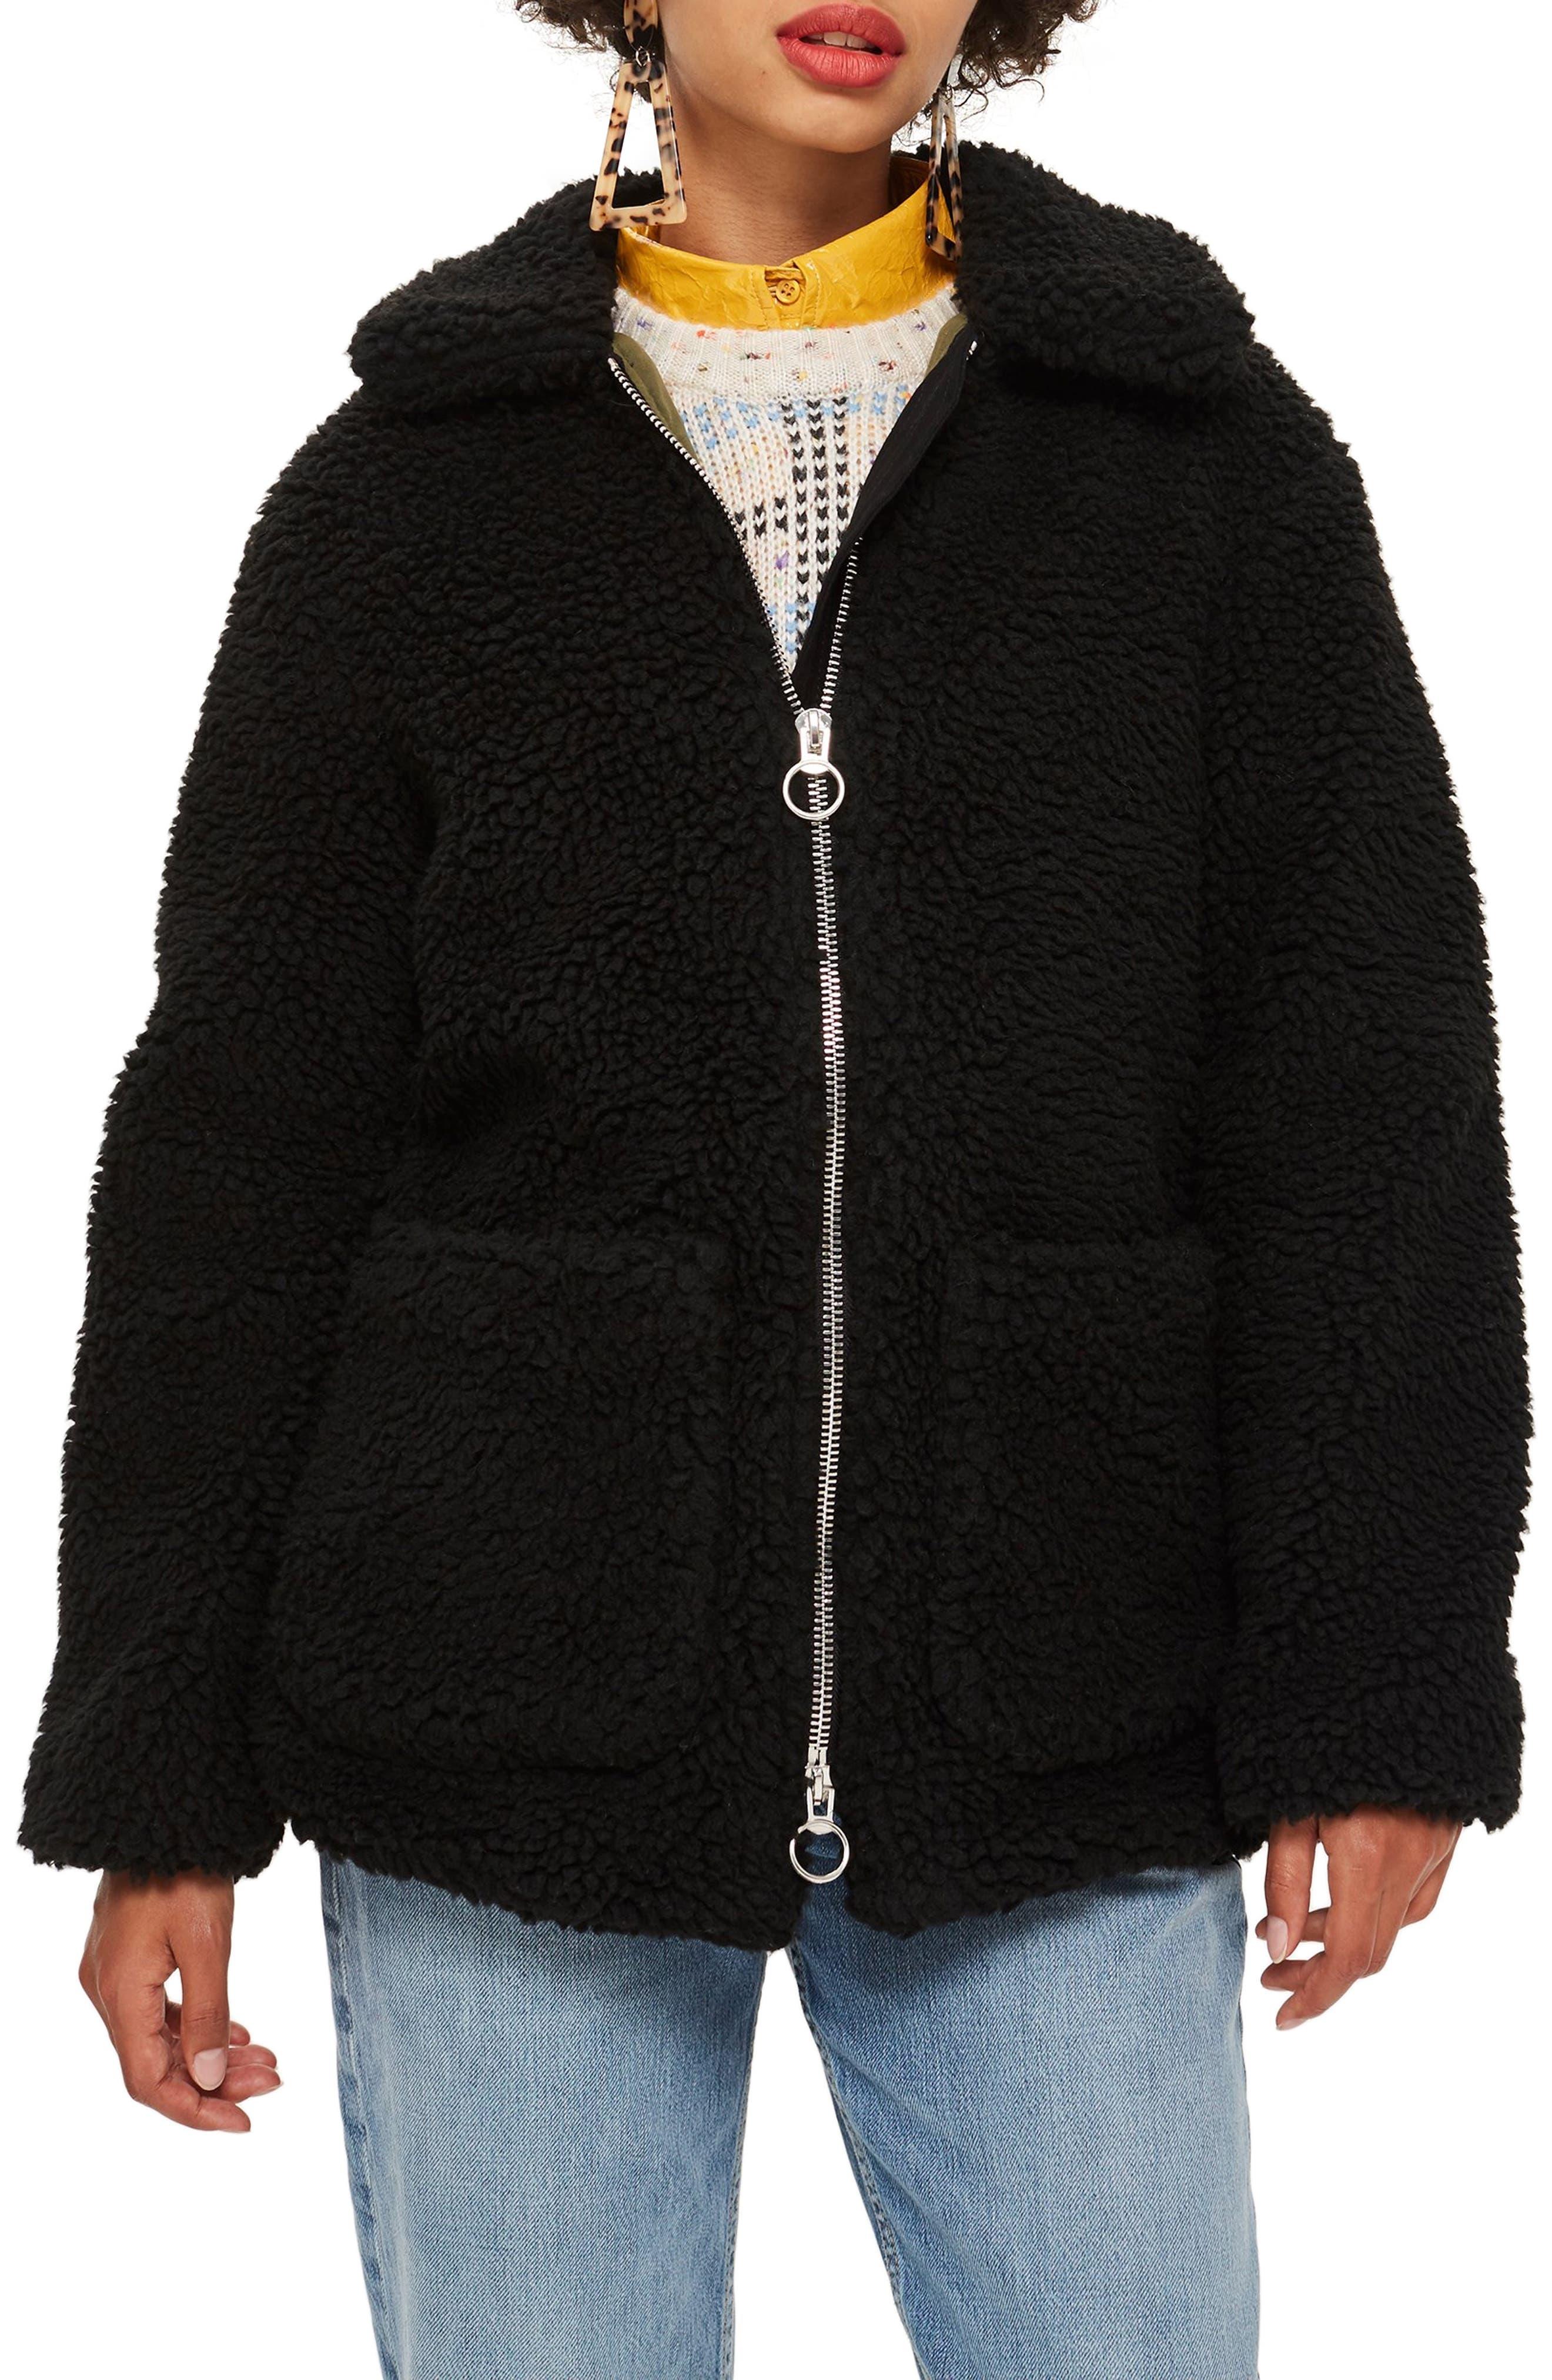 Borg Jacket,                         Main,                         color, BLACK